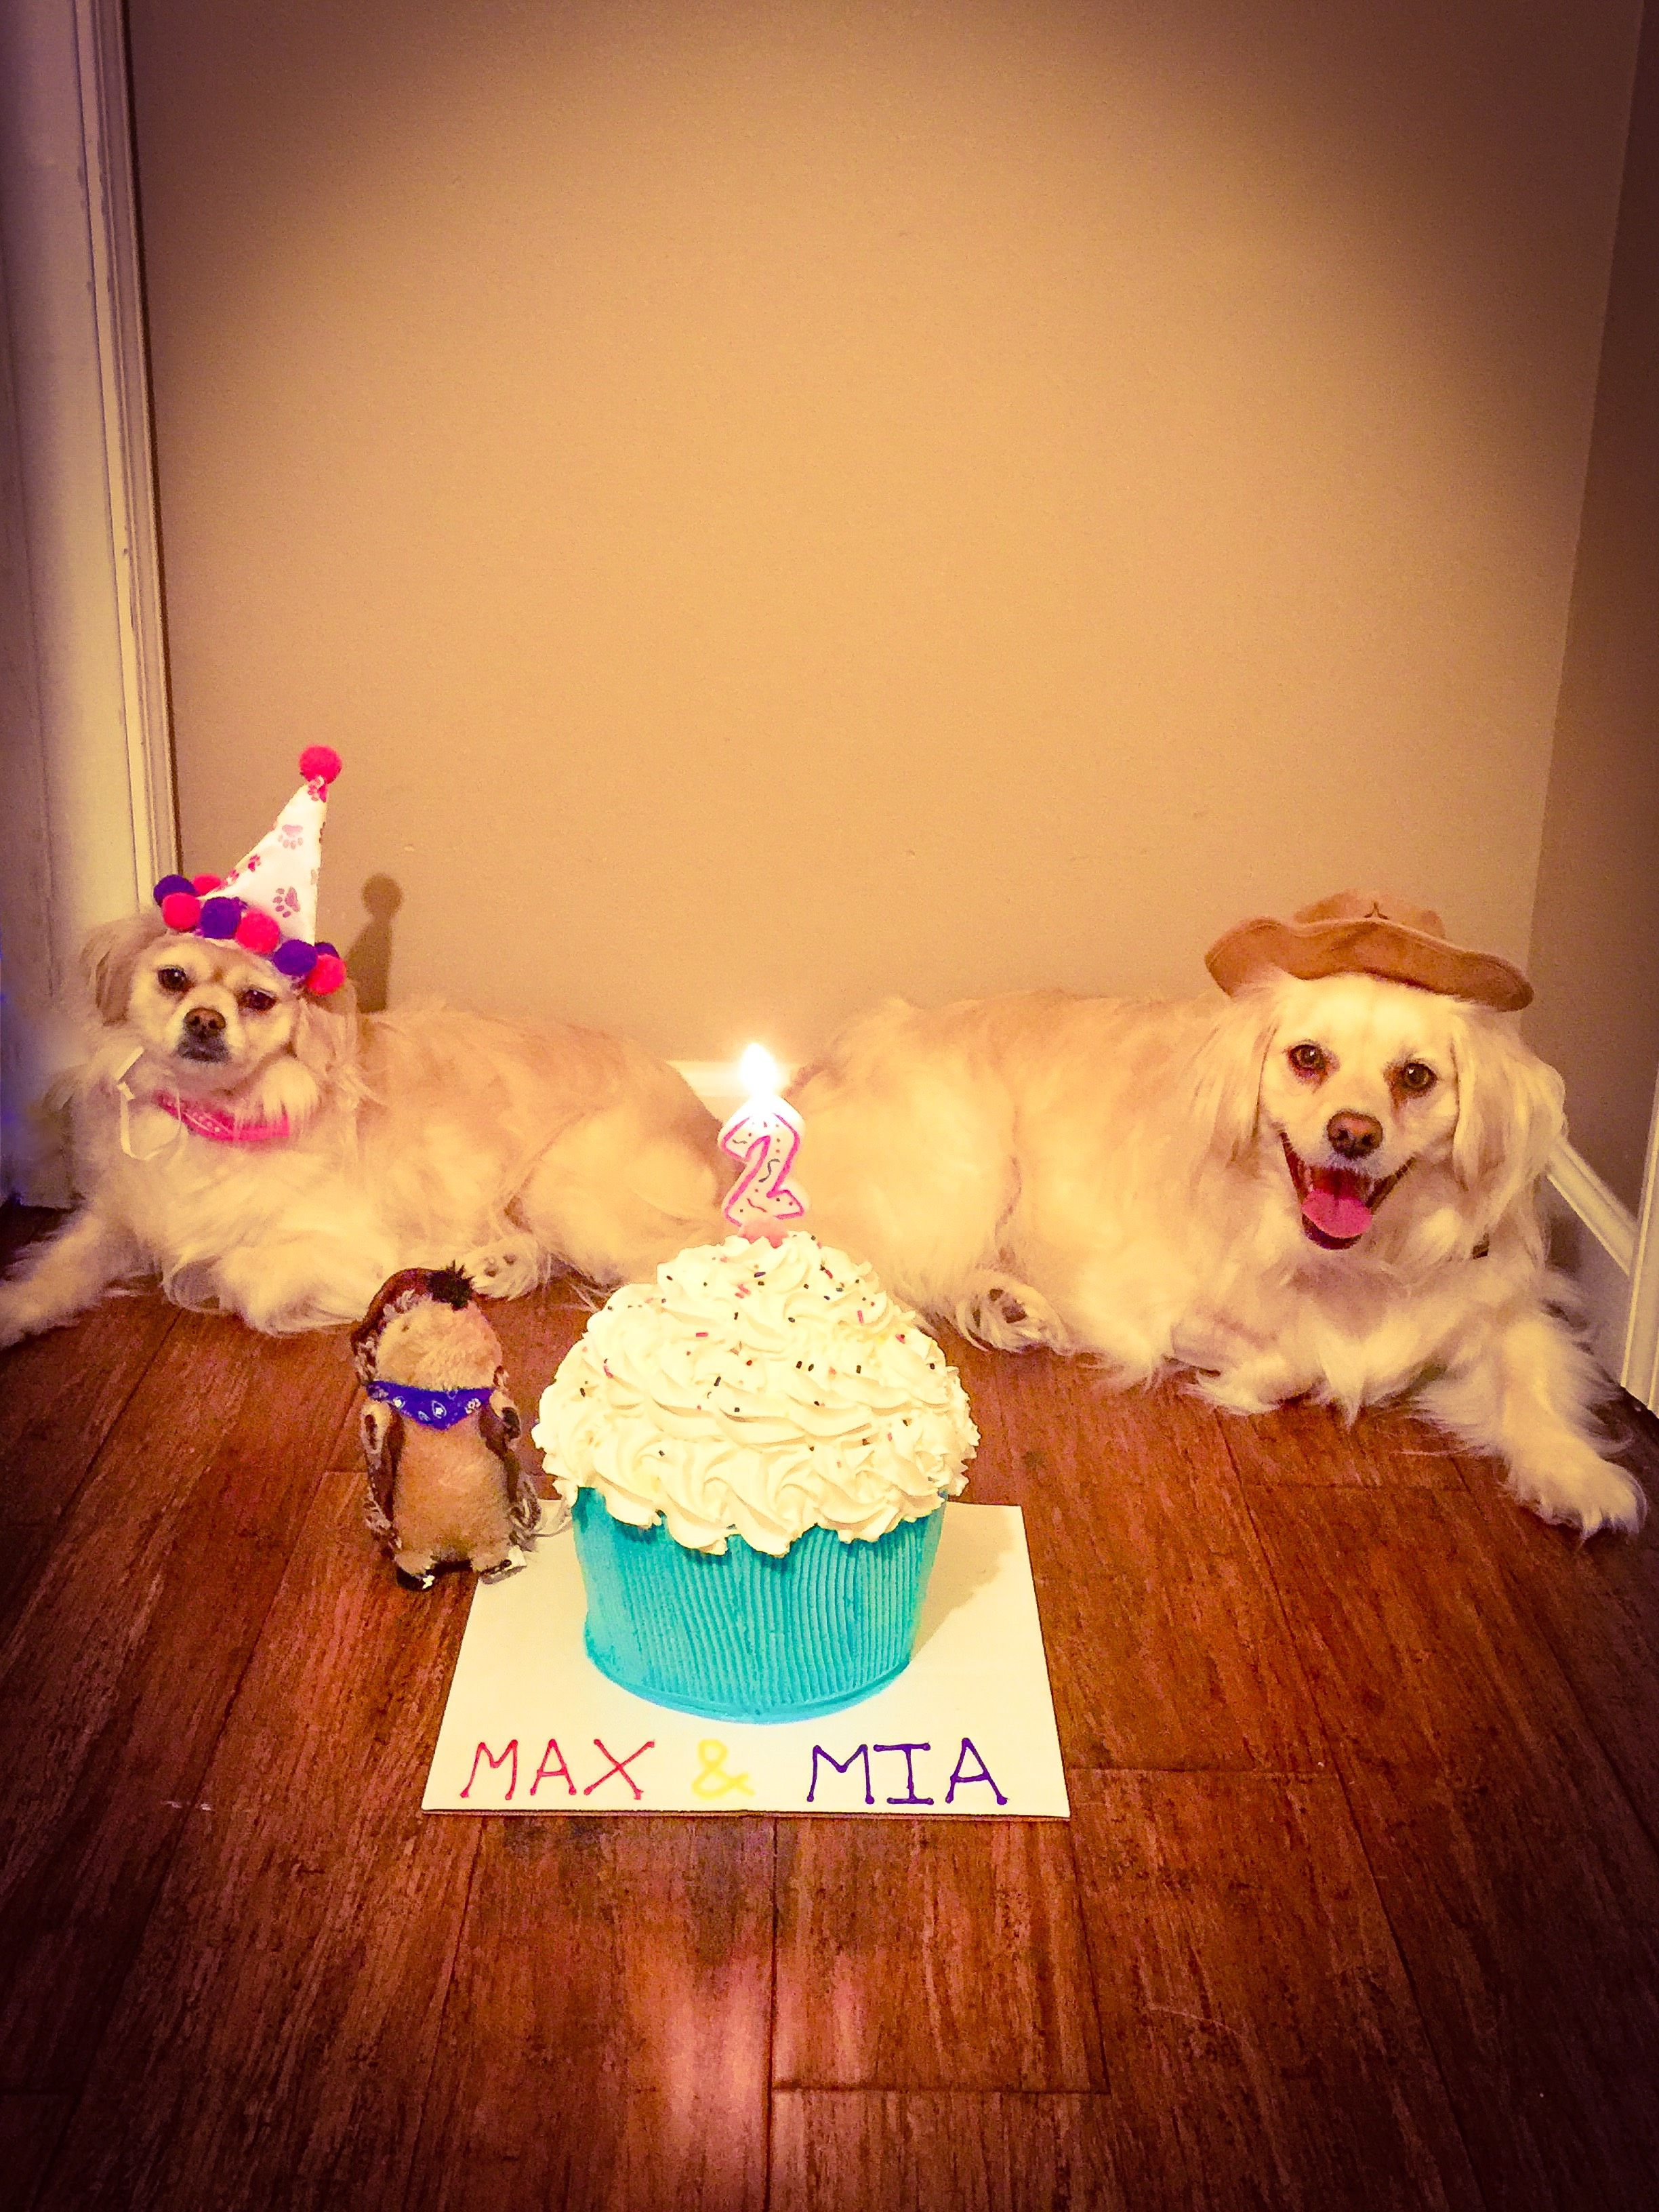 Max & Mia 2nd Bday🎈Both found on ADOPT! Don